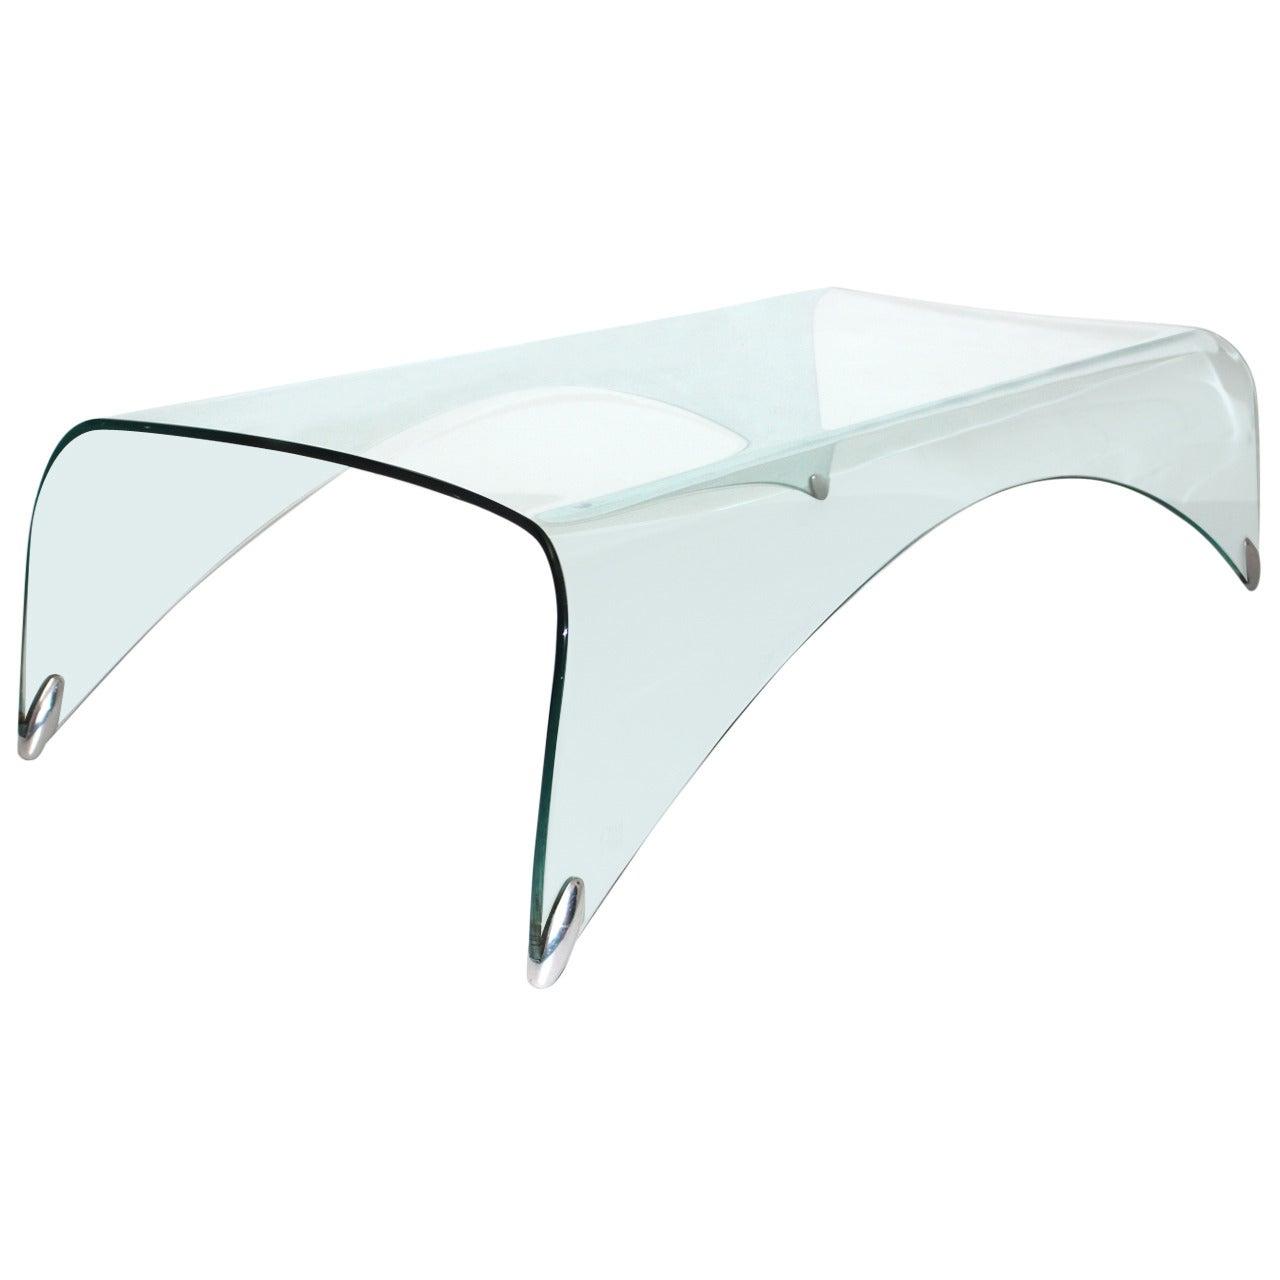 Modern Glass Vintage Coffee Table Sofa Table Genio Massimo Iosa Ghini, Italy